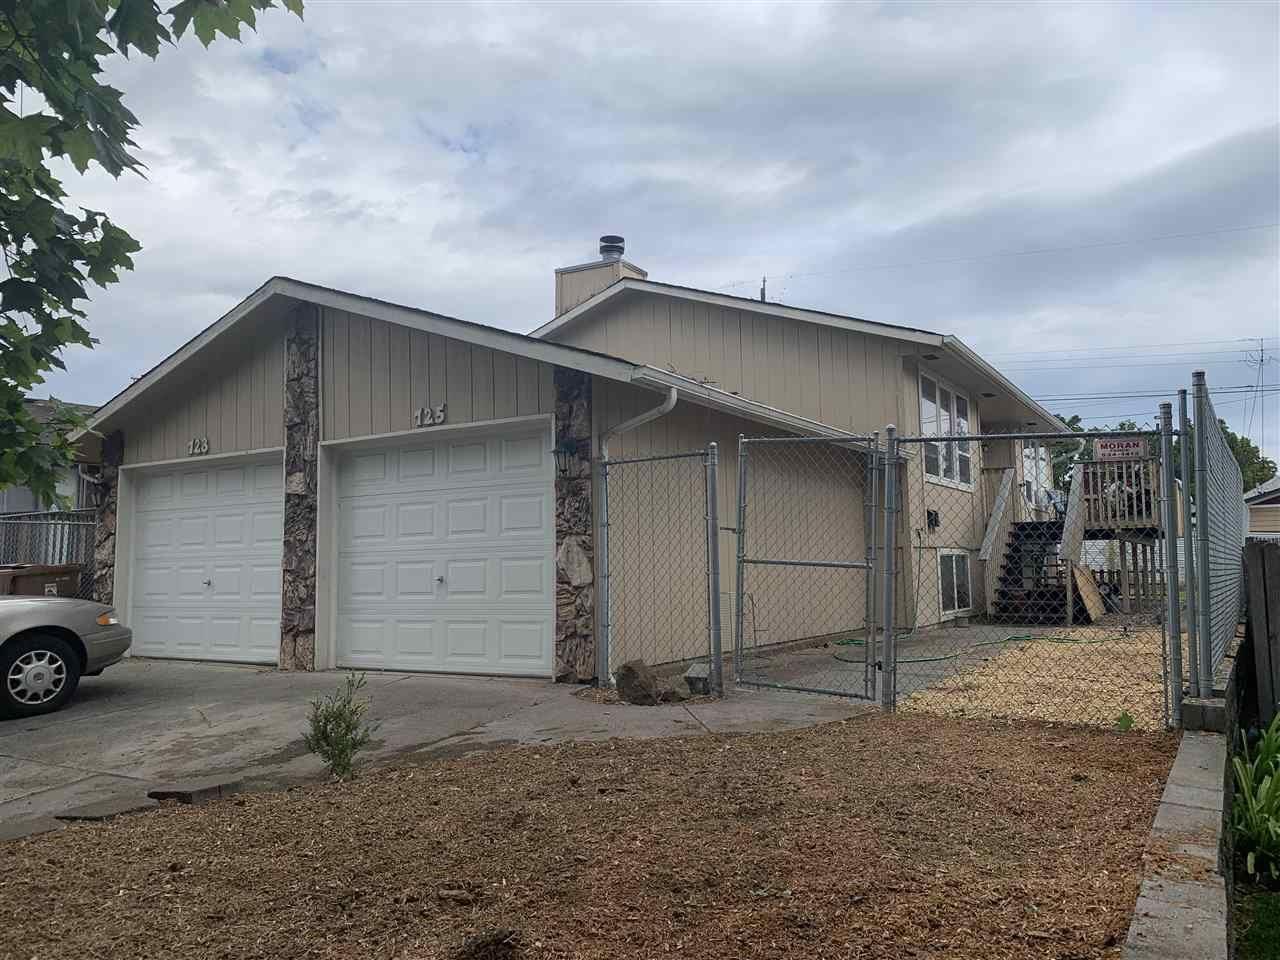 723 - 725 E Broad Ave, Spokane, WA 99207 - #: 202020544